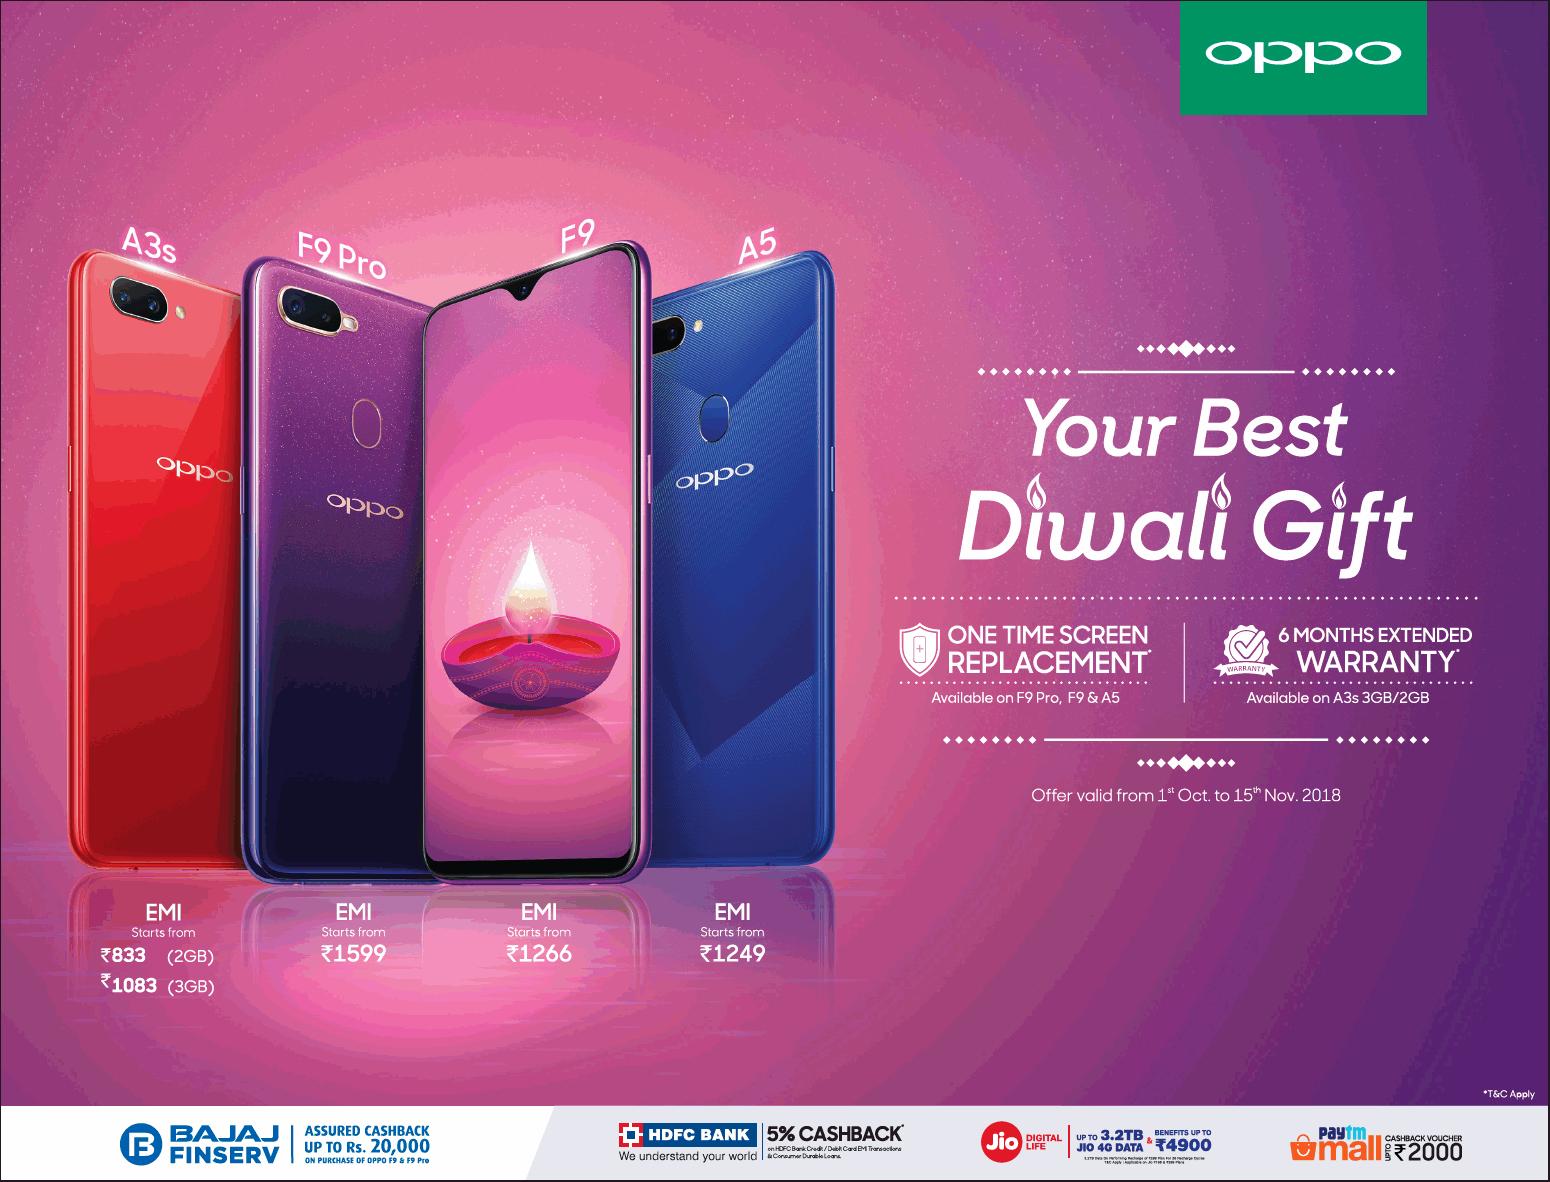 Oppo Phones Your Best Diwali Gift Ad - Advert Gallery